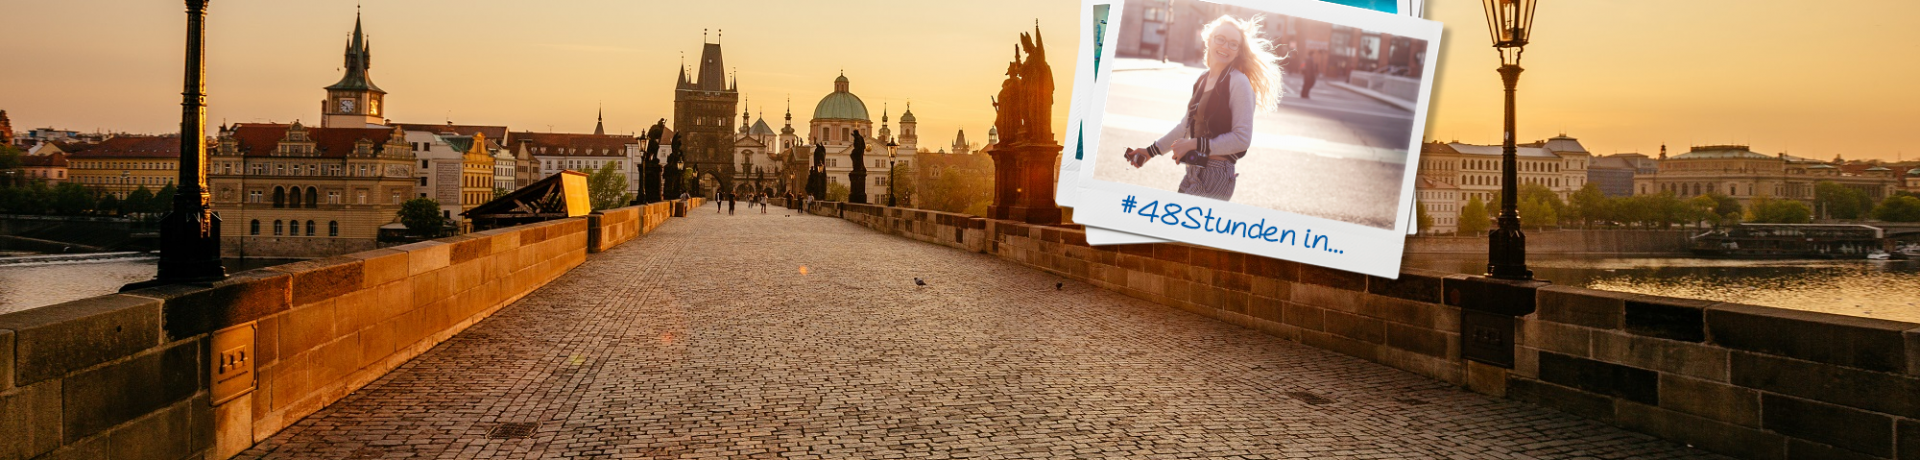 Tschechien: Prag Karlsbrücke Polaroid